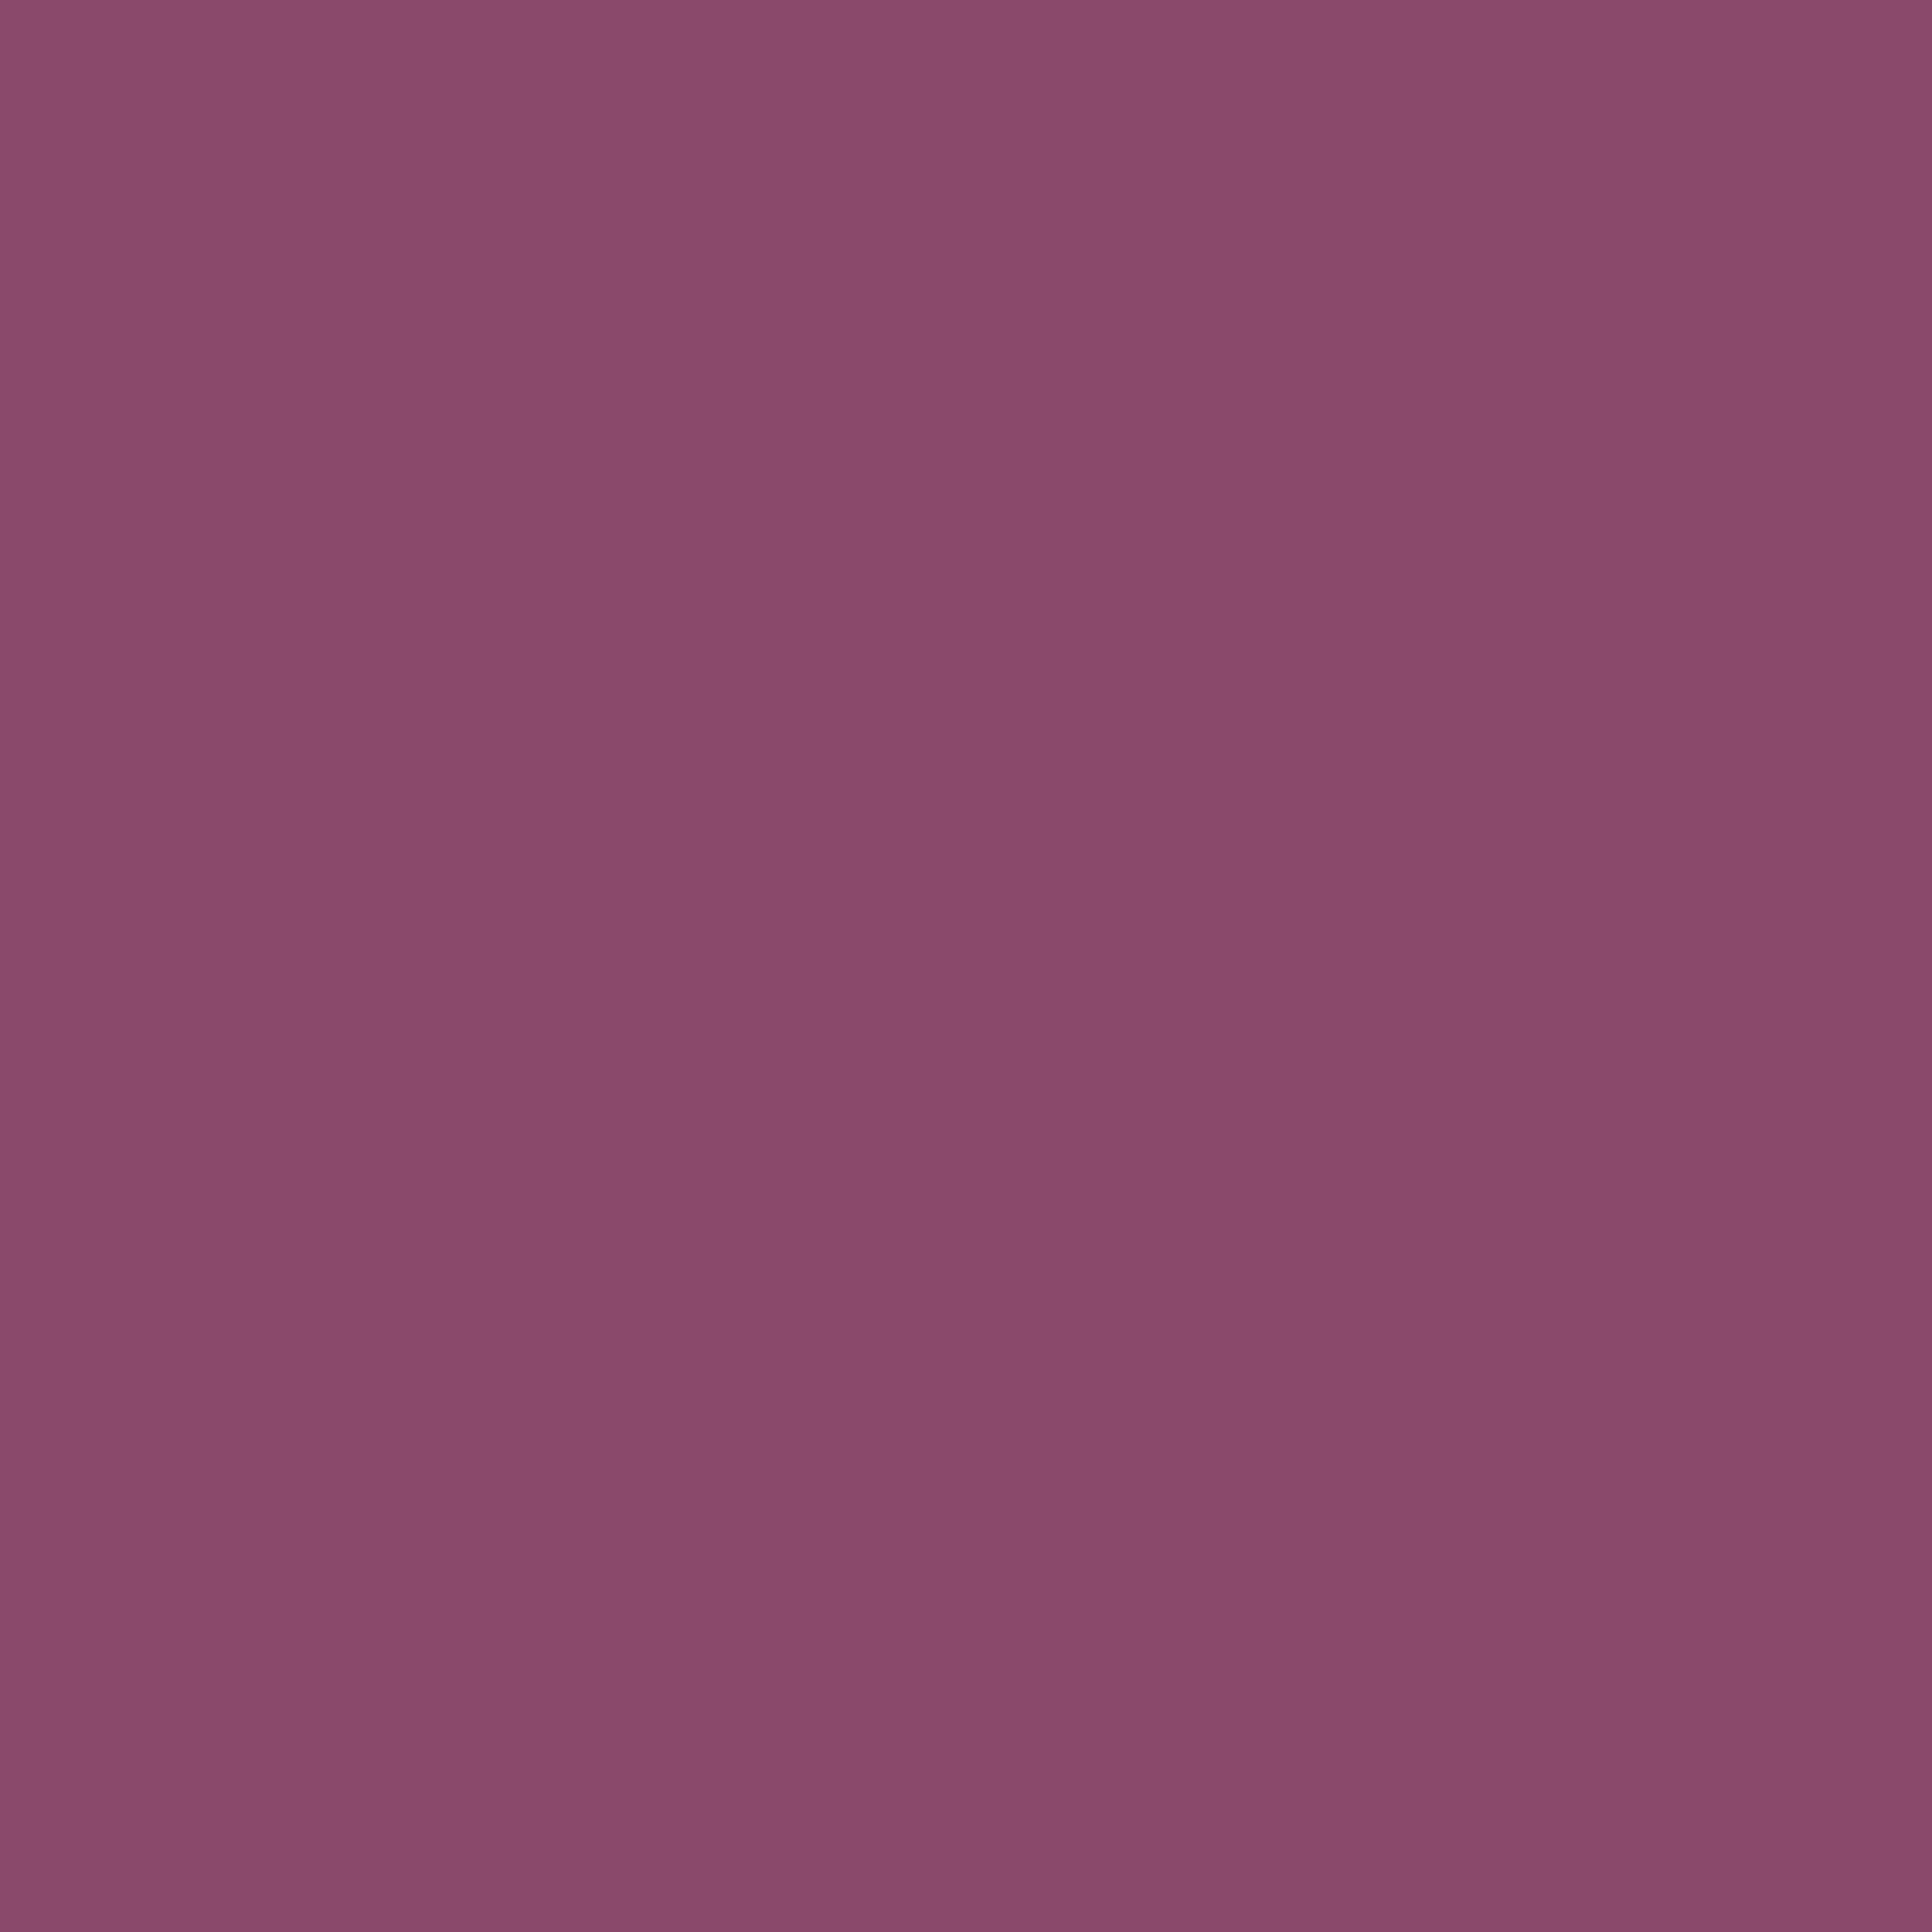 2732x2732 Twilight Lavender Solid Color Background